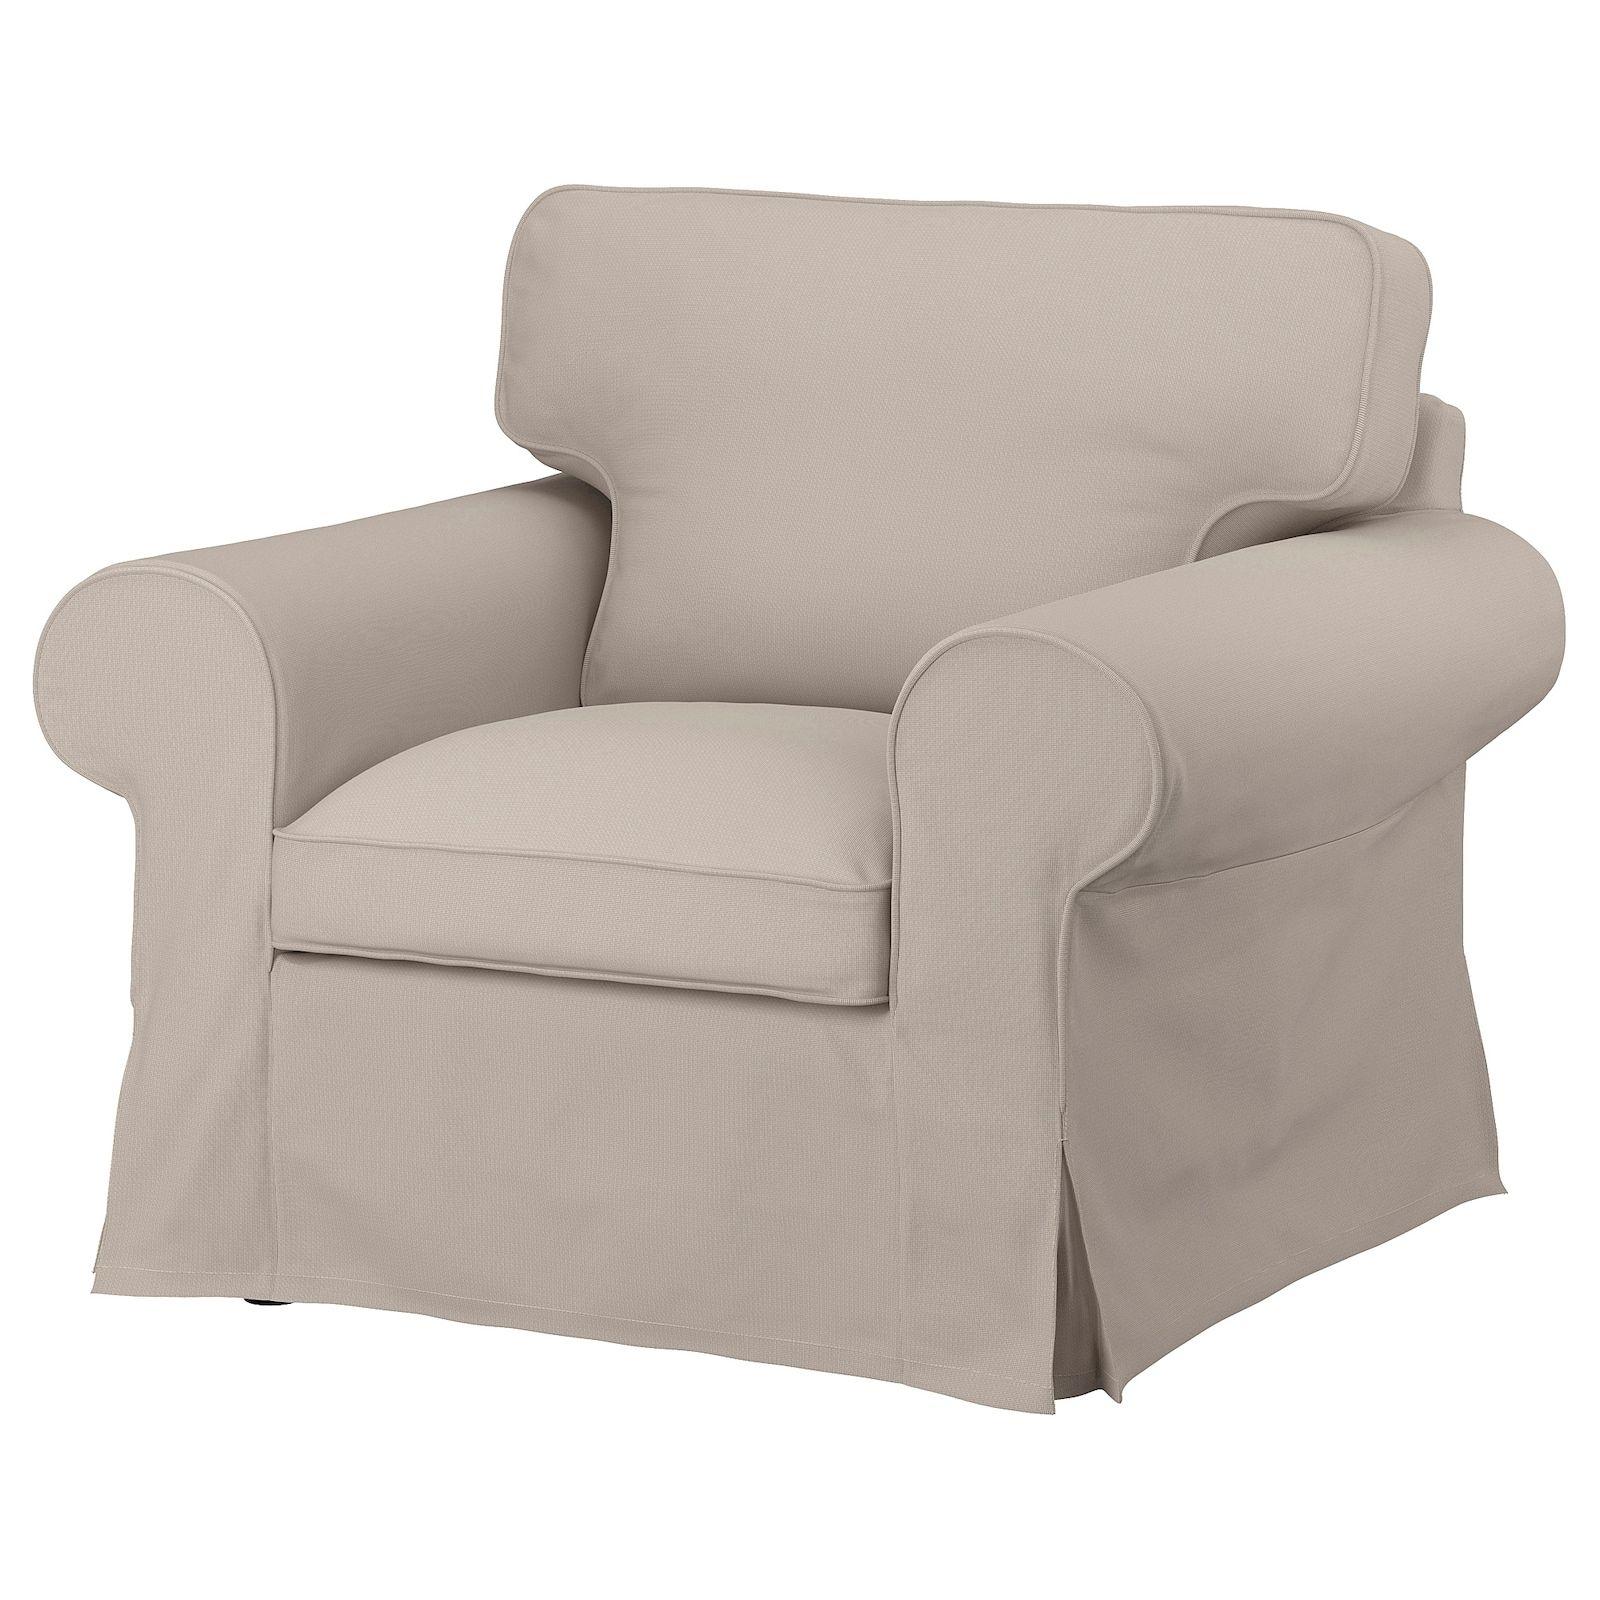 Uppland Armchair – Totebo Light Beige – Ikea   Armchair For Zalina Swivel Armchairs (View 7 of 15)